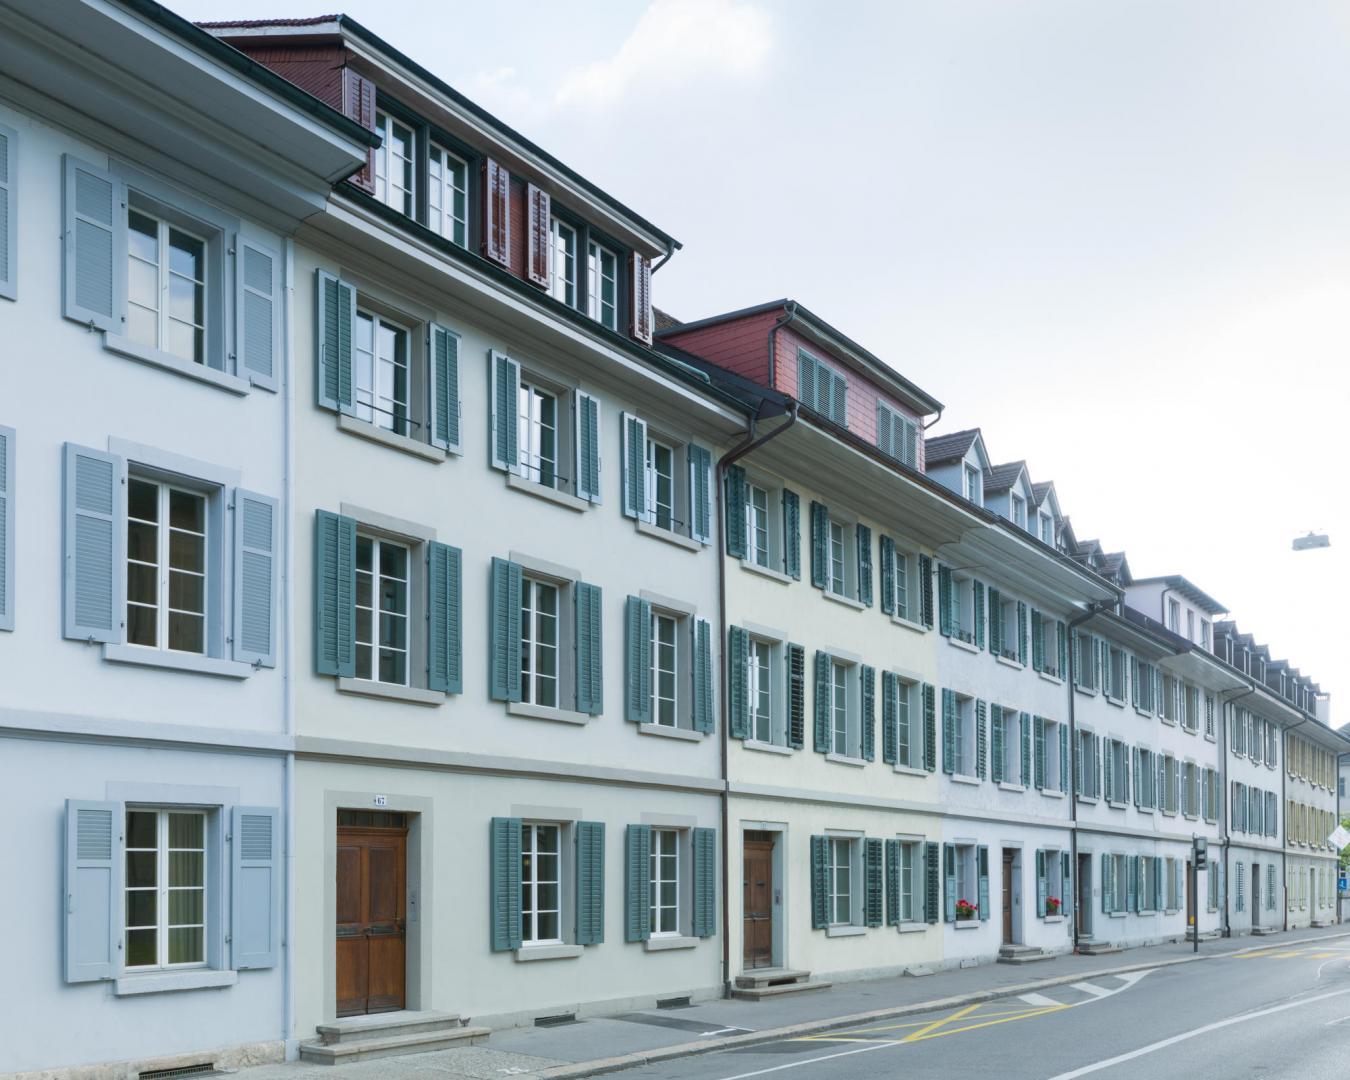 altstadthaus aarau architekturb ro herbert bruhin. Black Bedroom Furniture Sets. Home Design Ideas